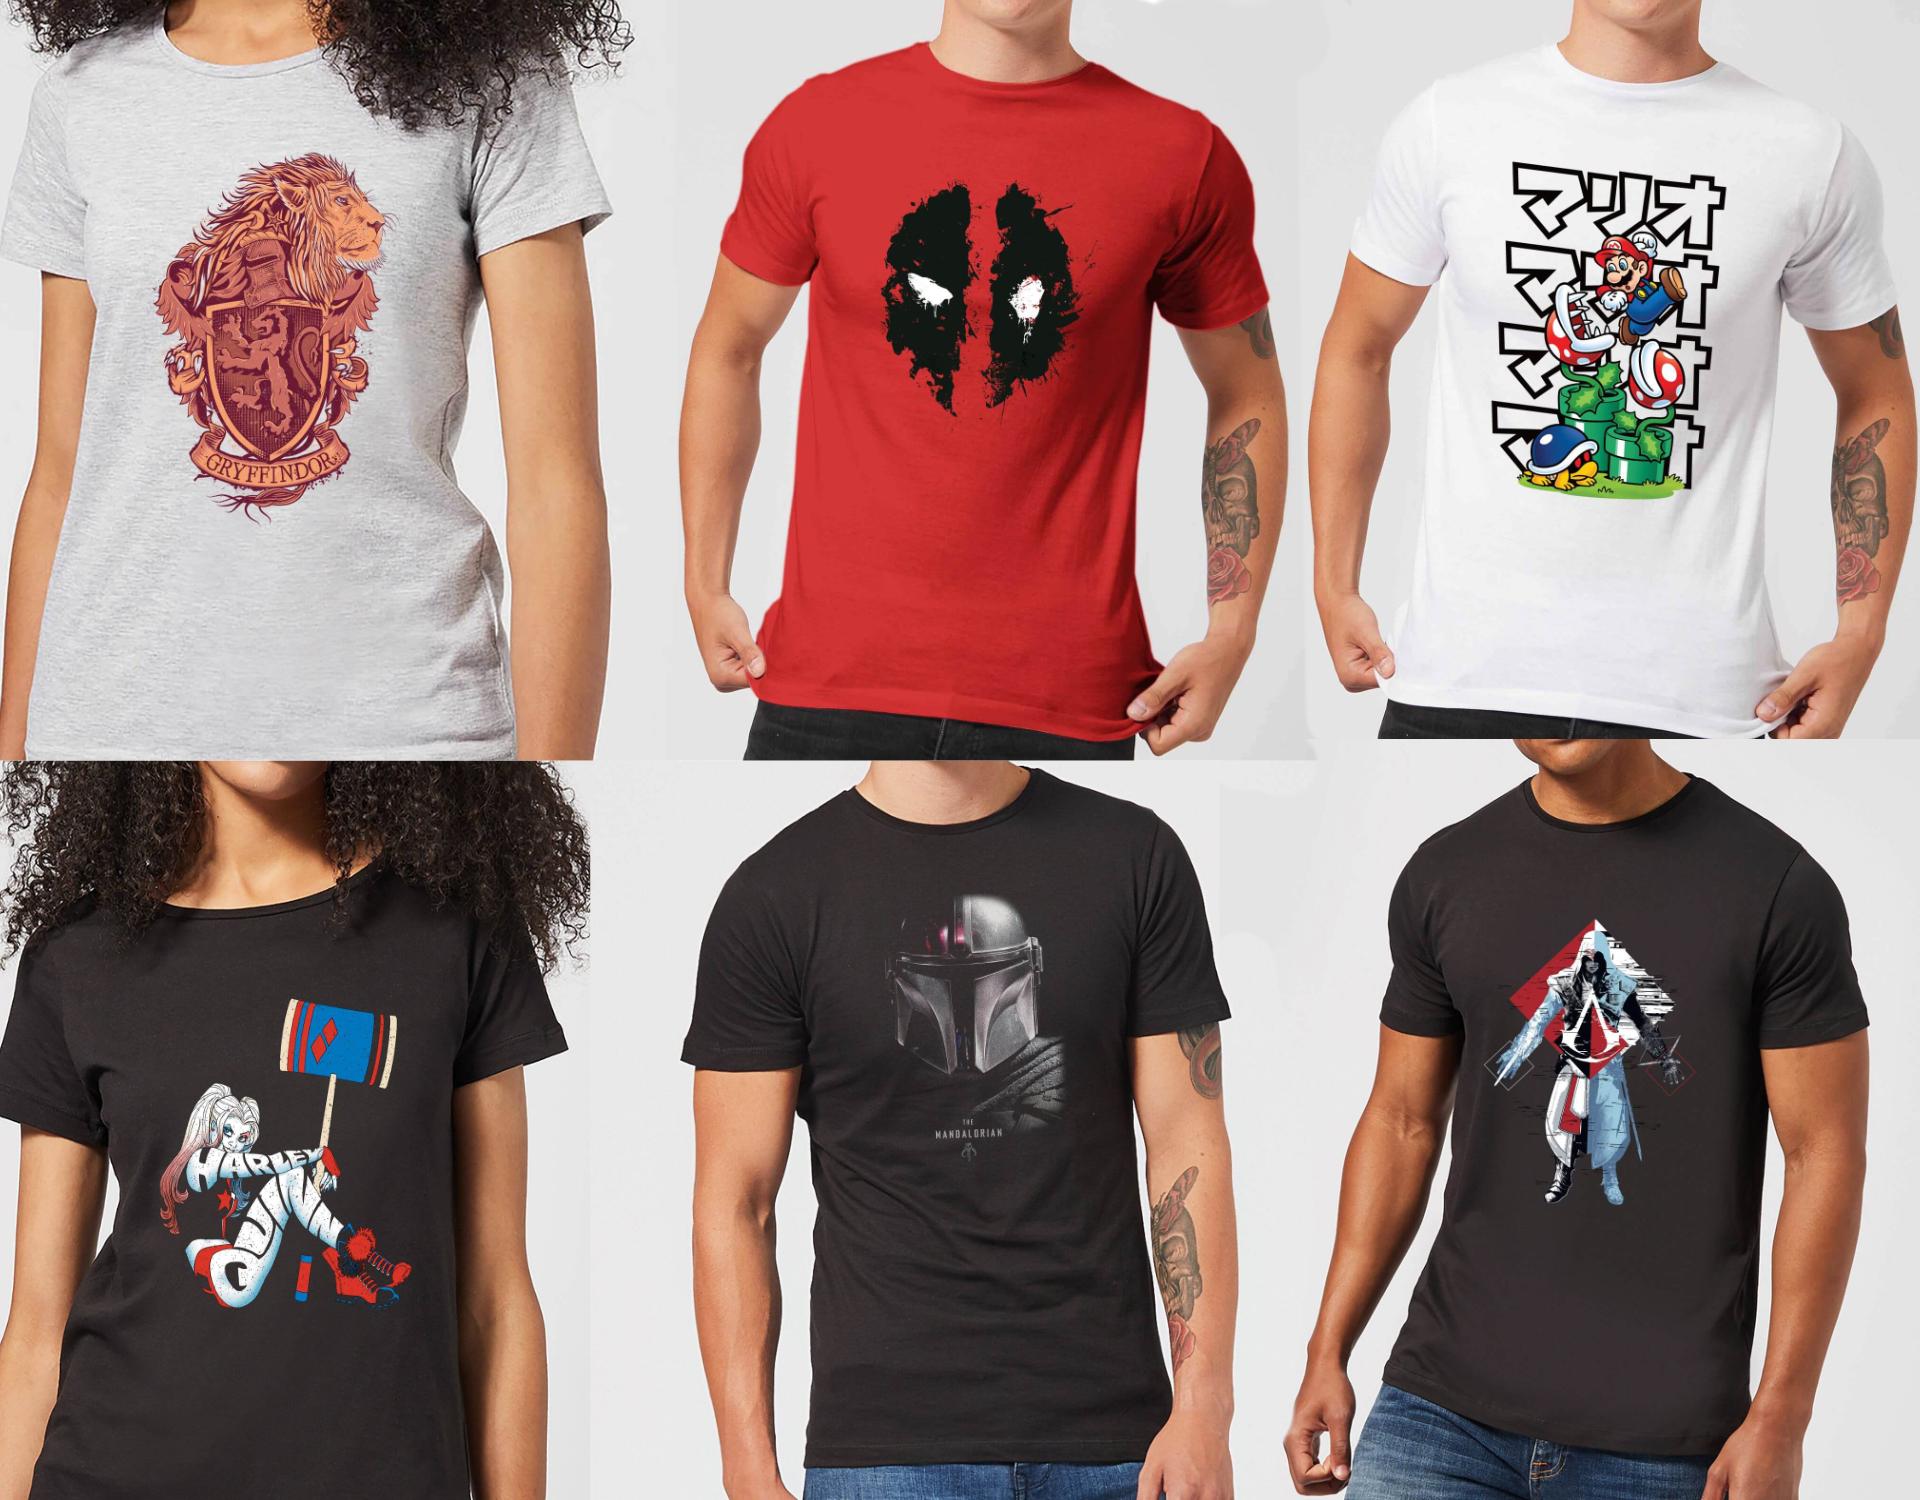 2 licencjonowane T-shirty za £18 @zavvi